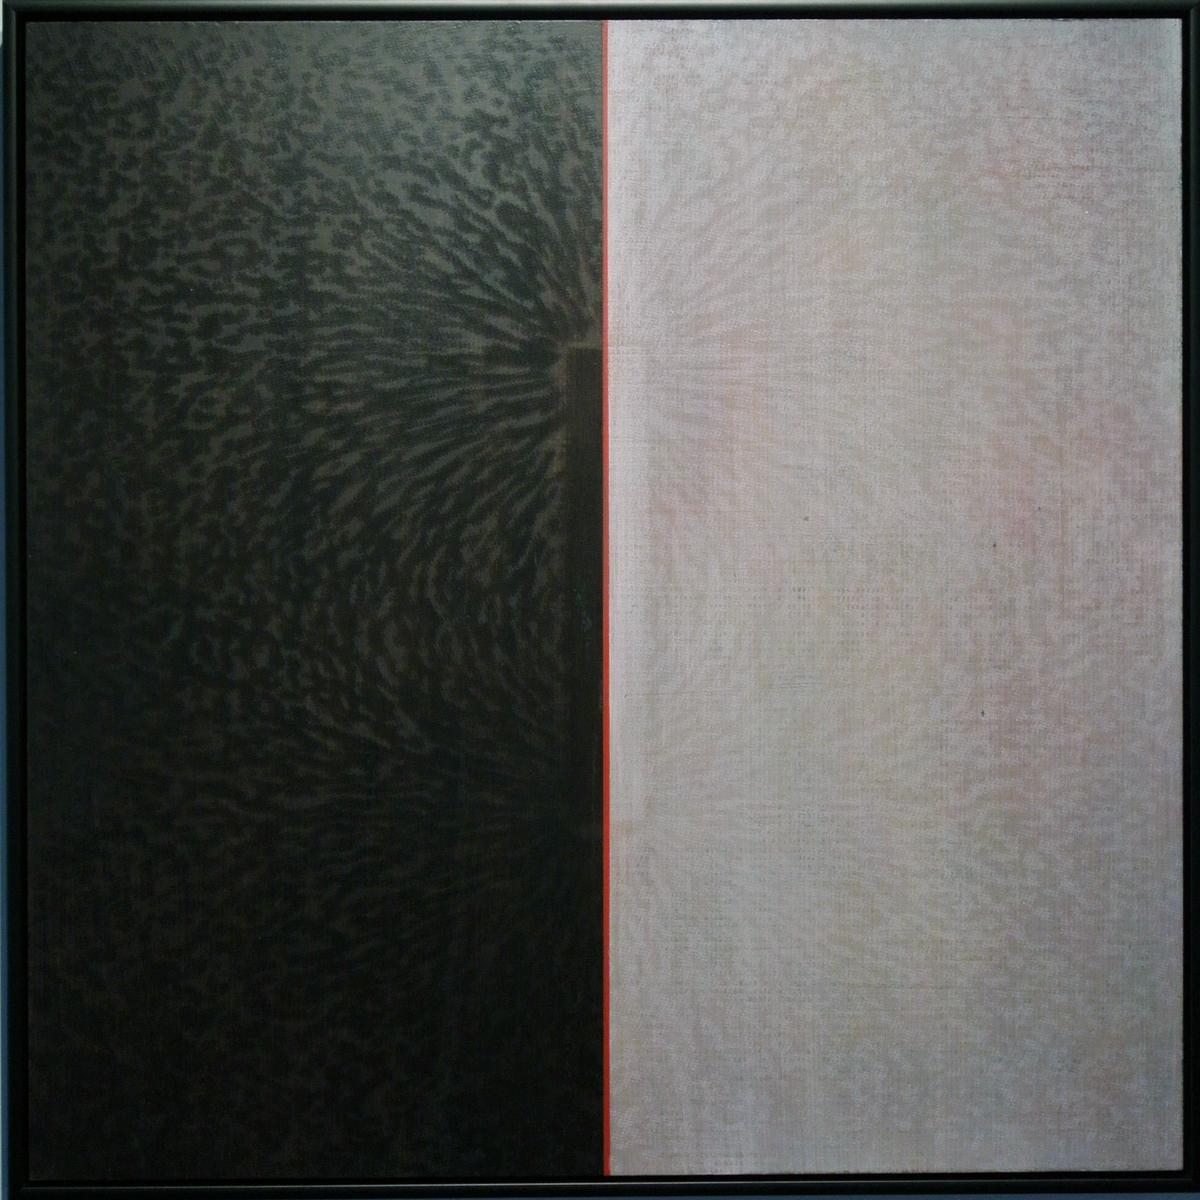 Simon Hunter - Poles Apart